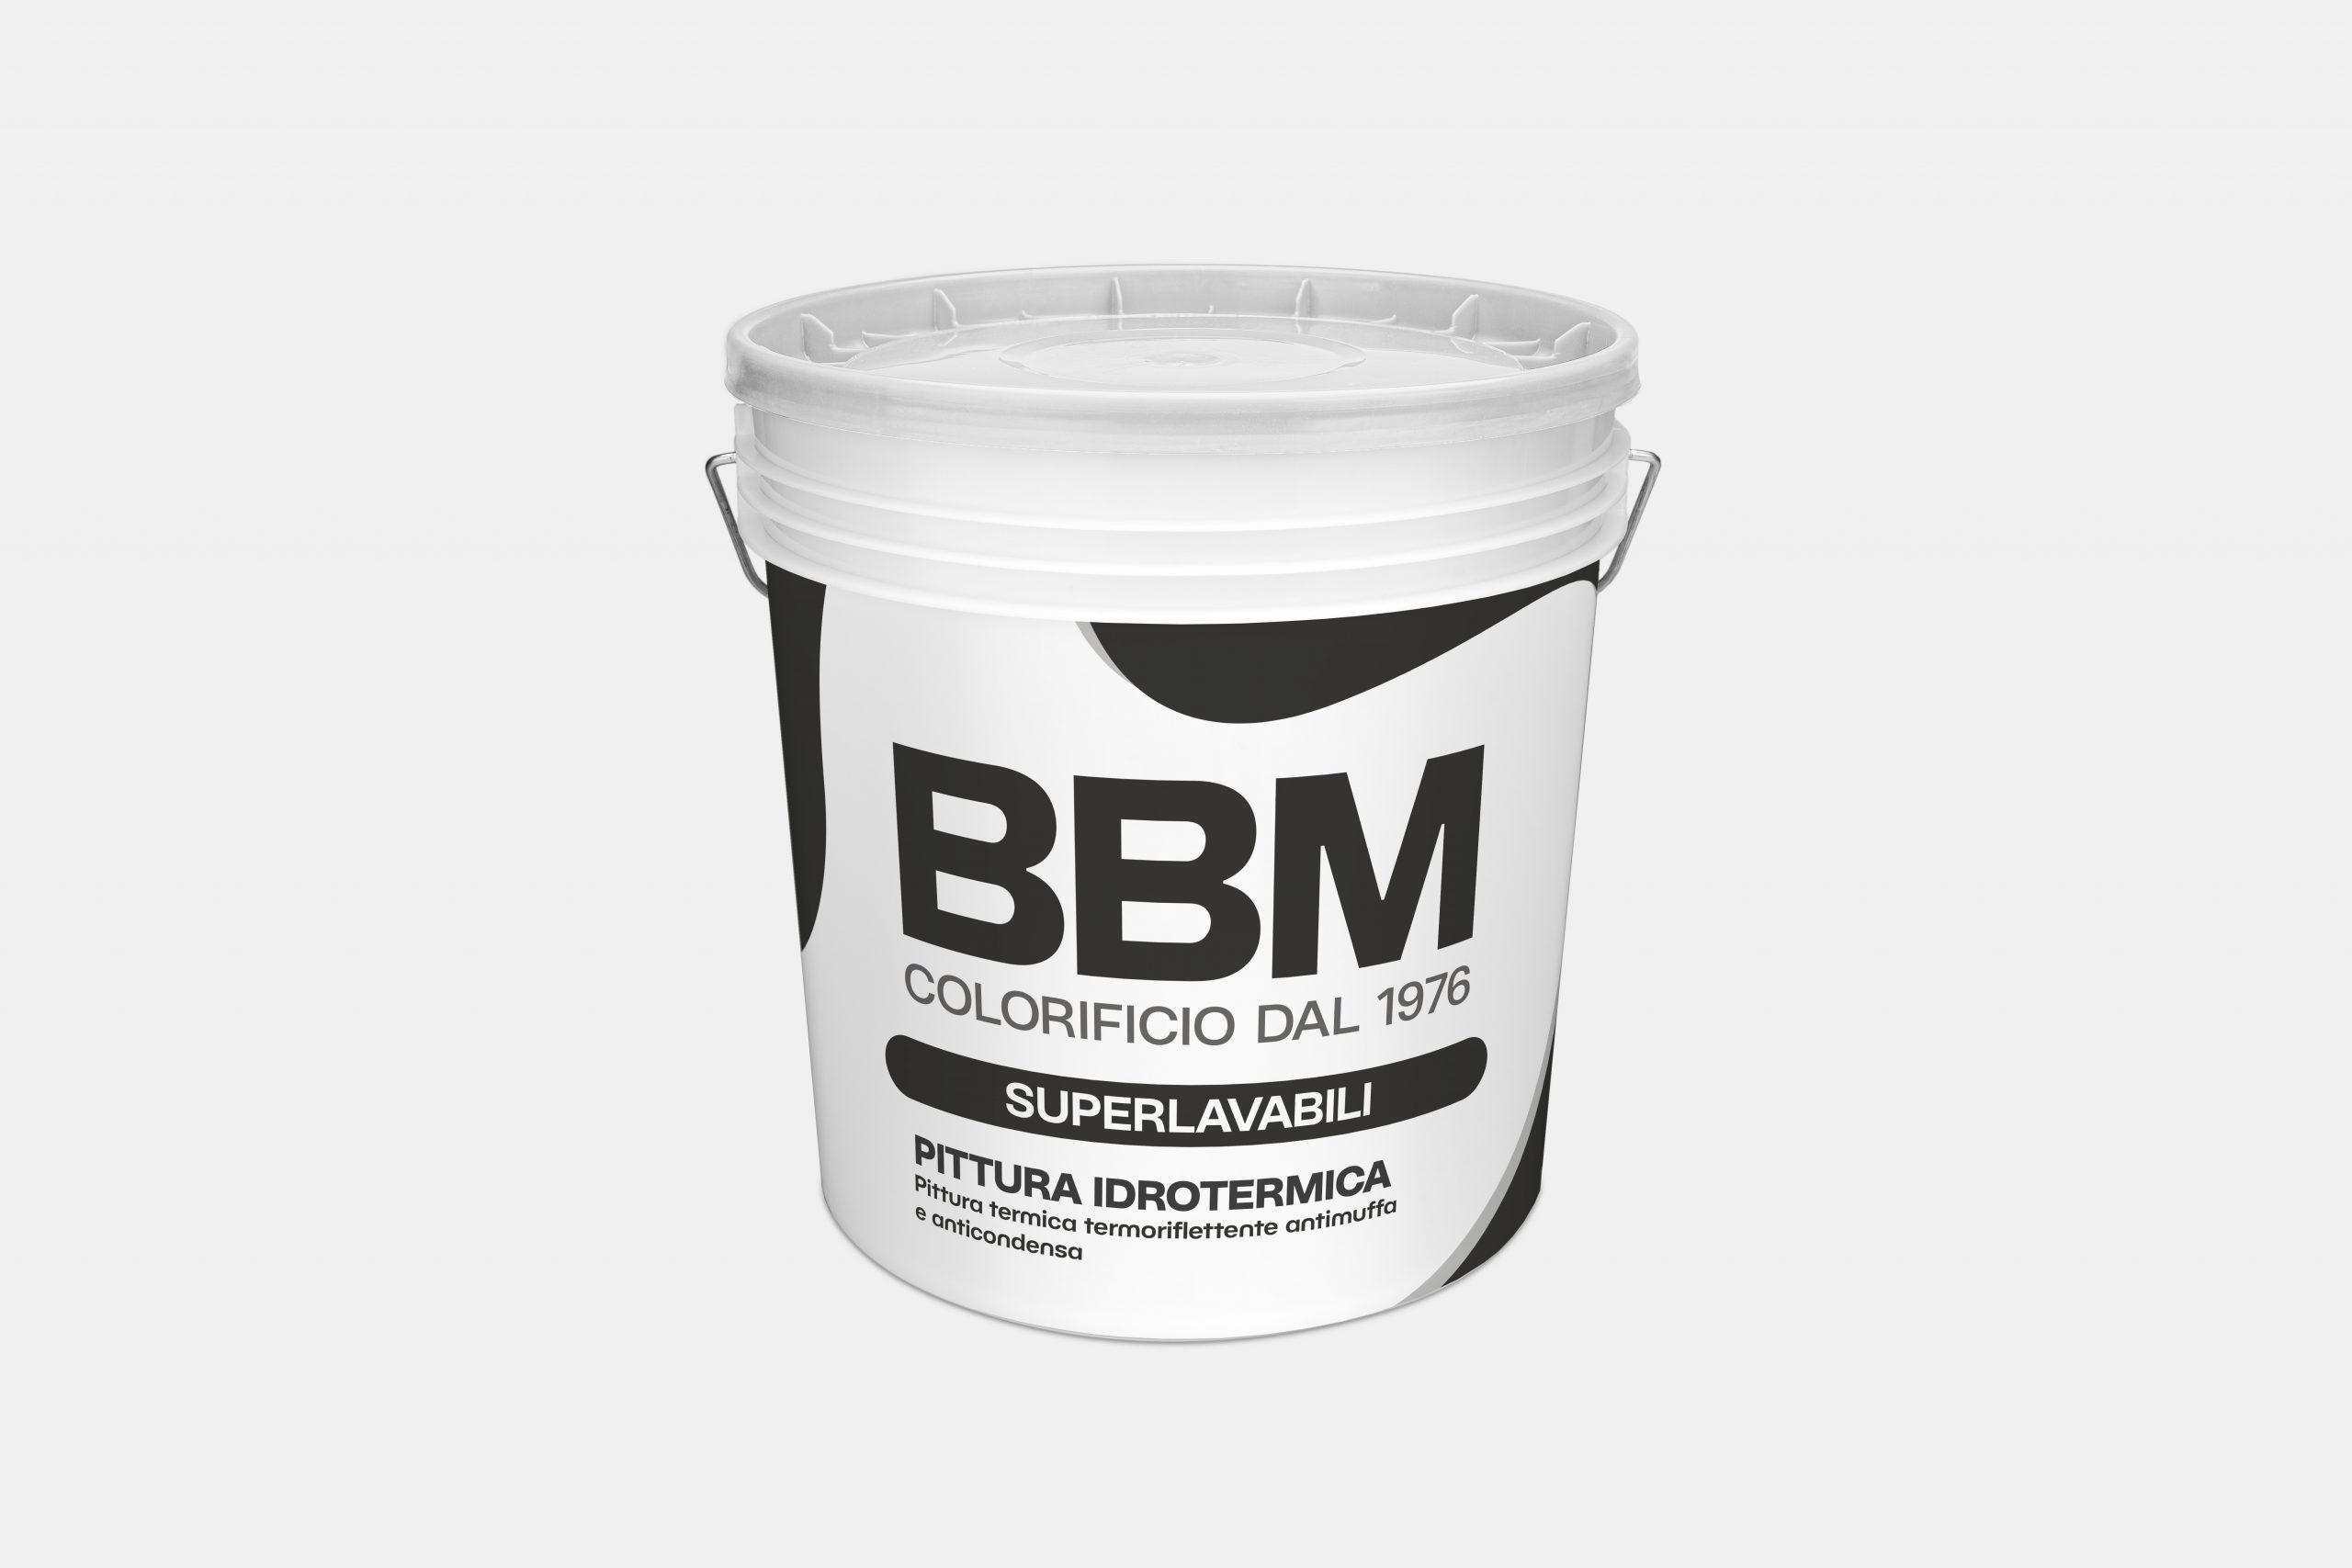 https://bbm-colorificio.it/wp-content/uploads/2021/05/Pittura-idrotermica-scaled.jpg